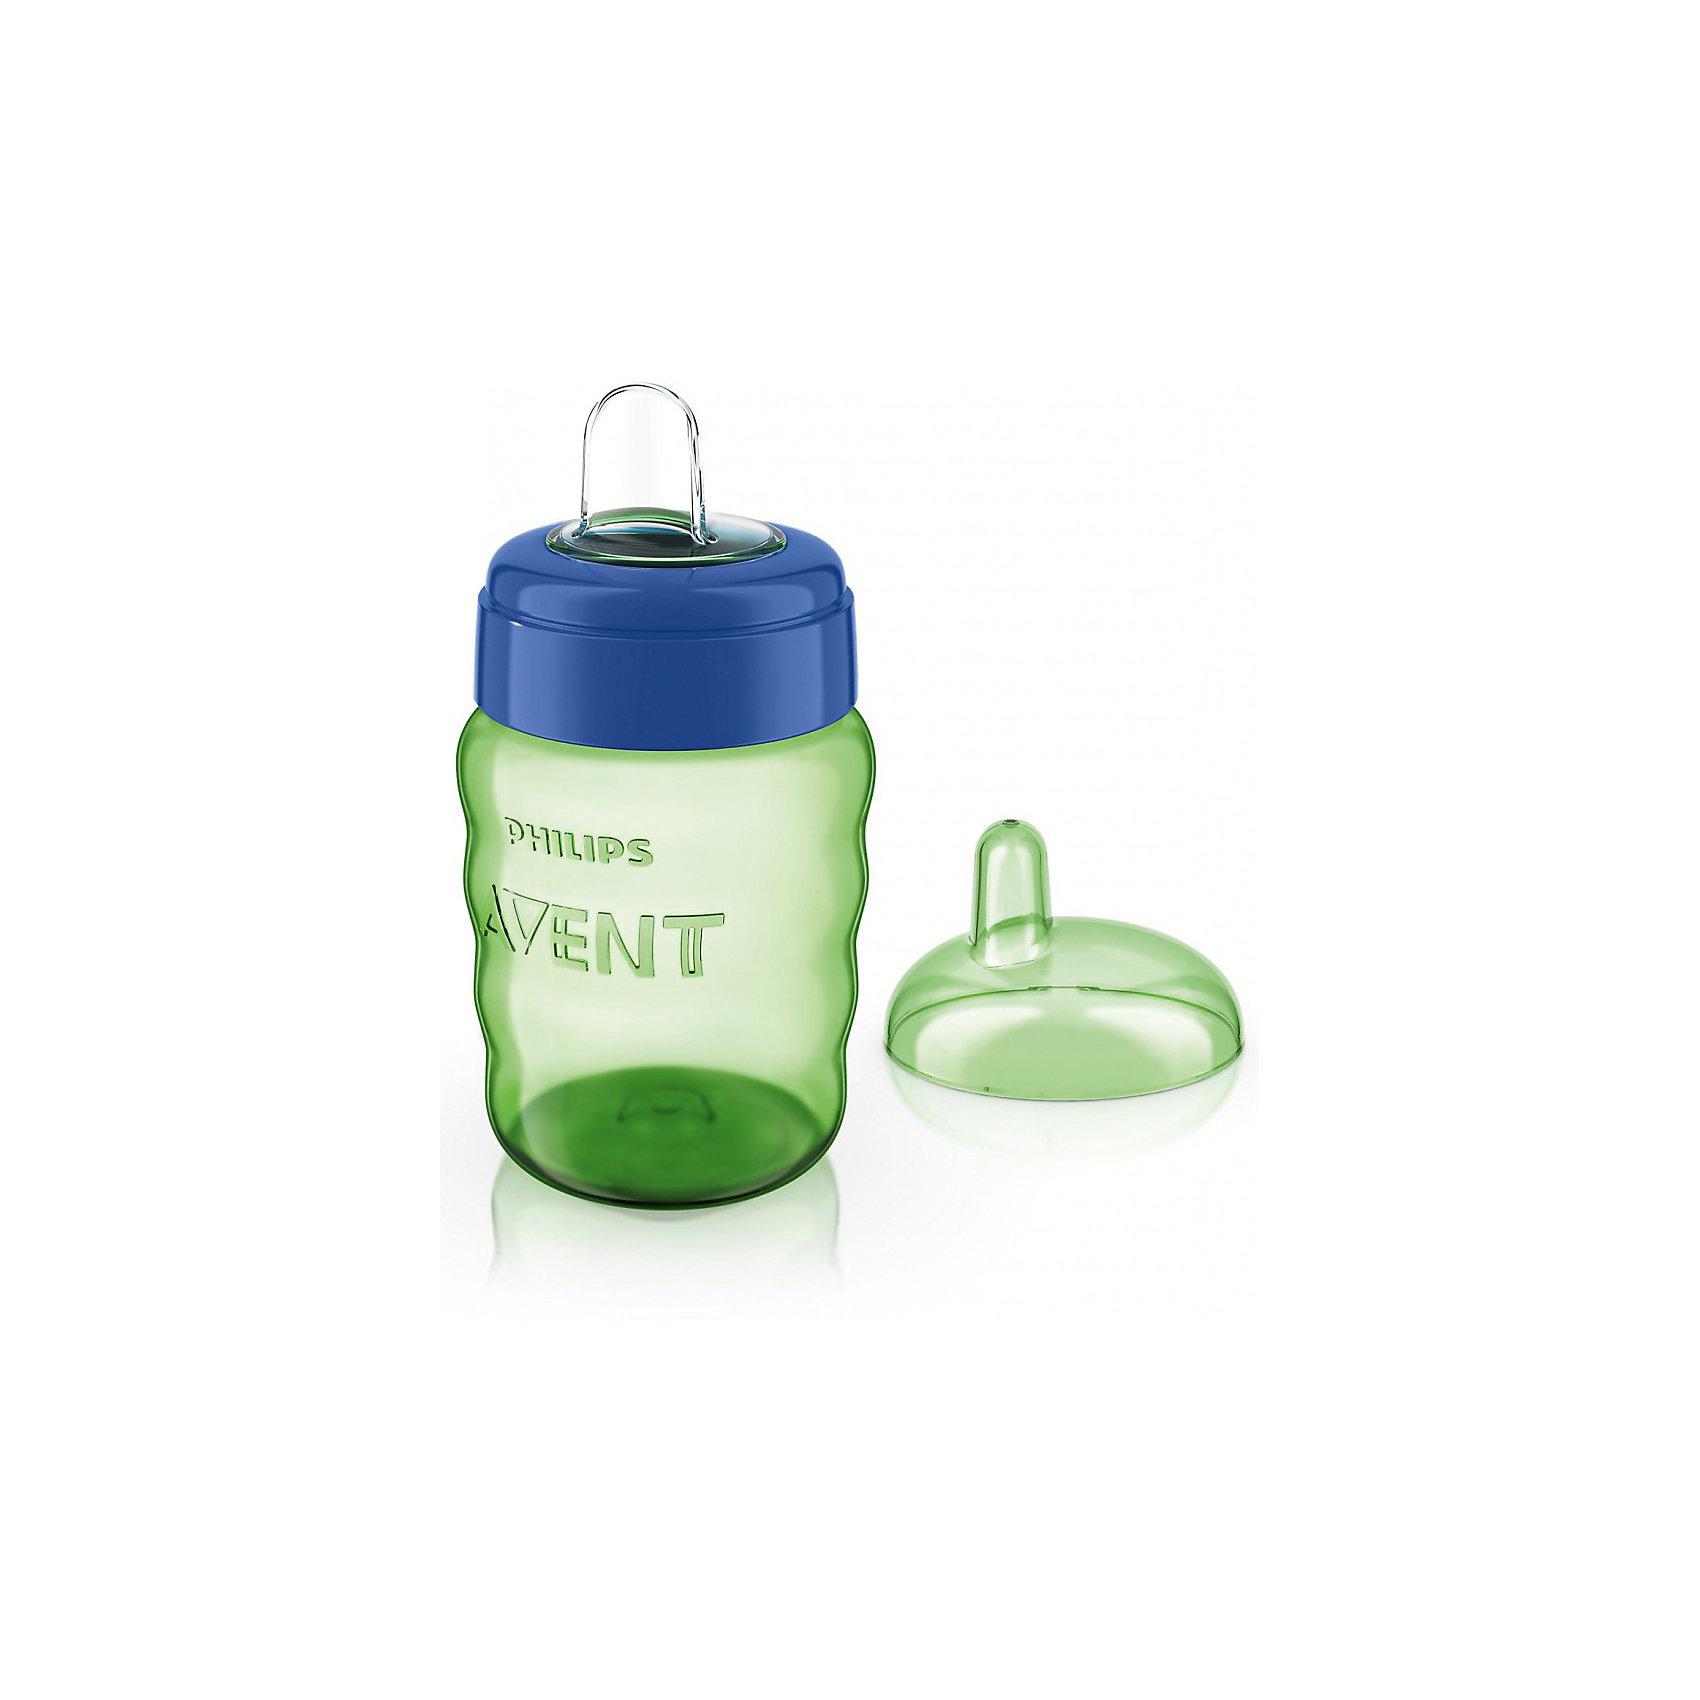 PHILIPS AVENT Чашка-поильник с носиком Comfort, 260 мл, Avent, зеленый/синий